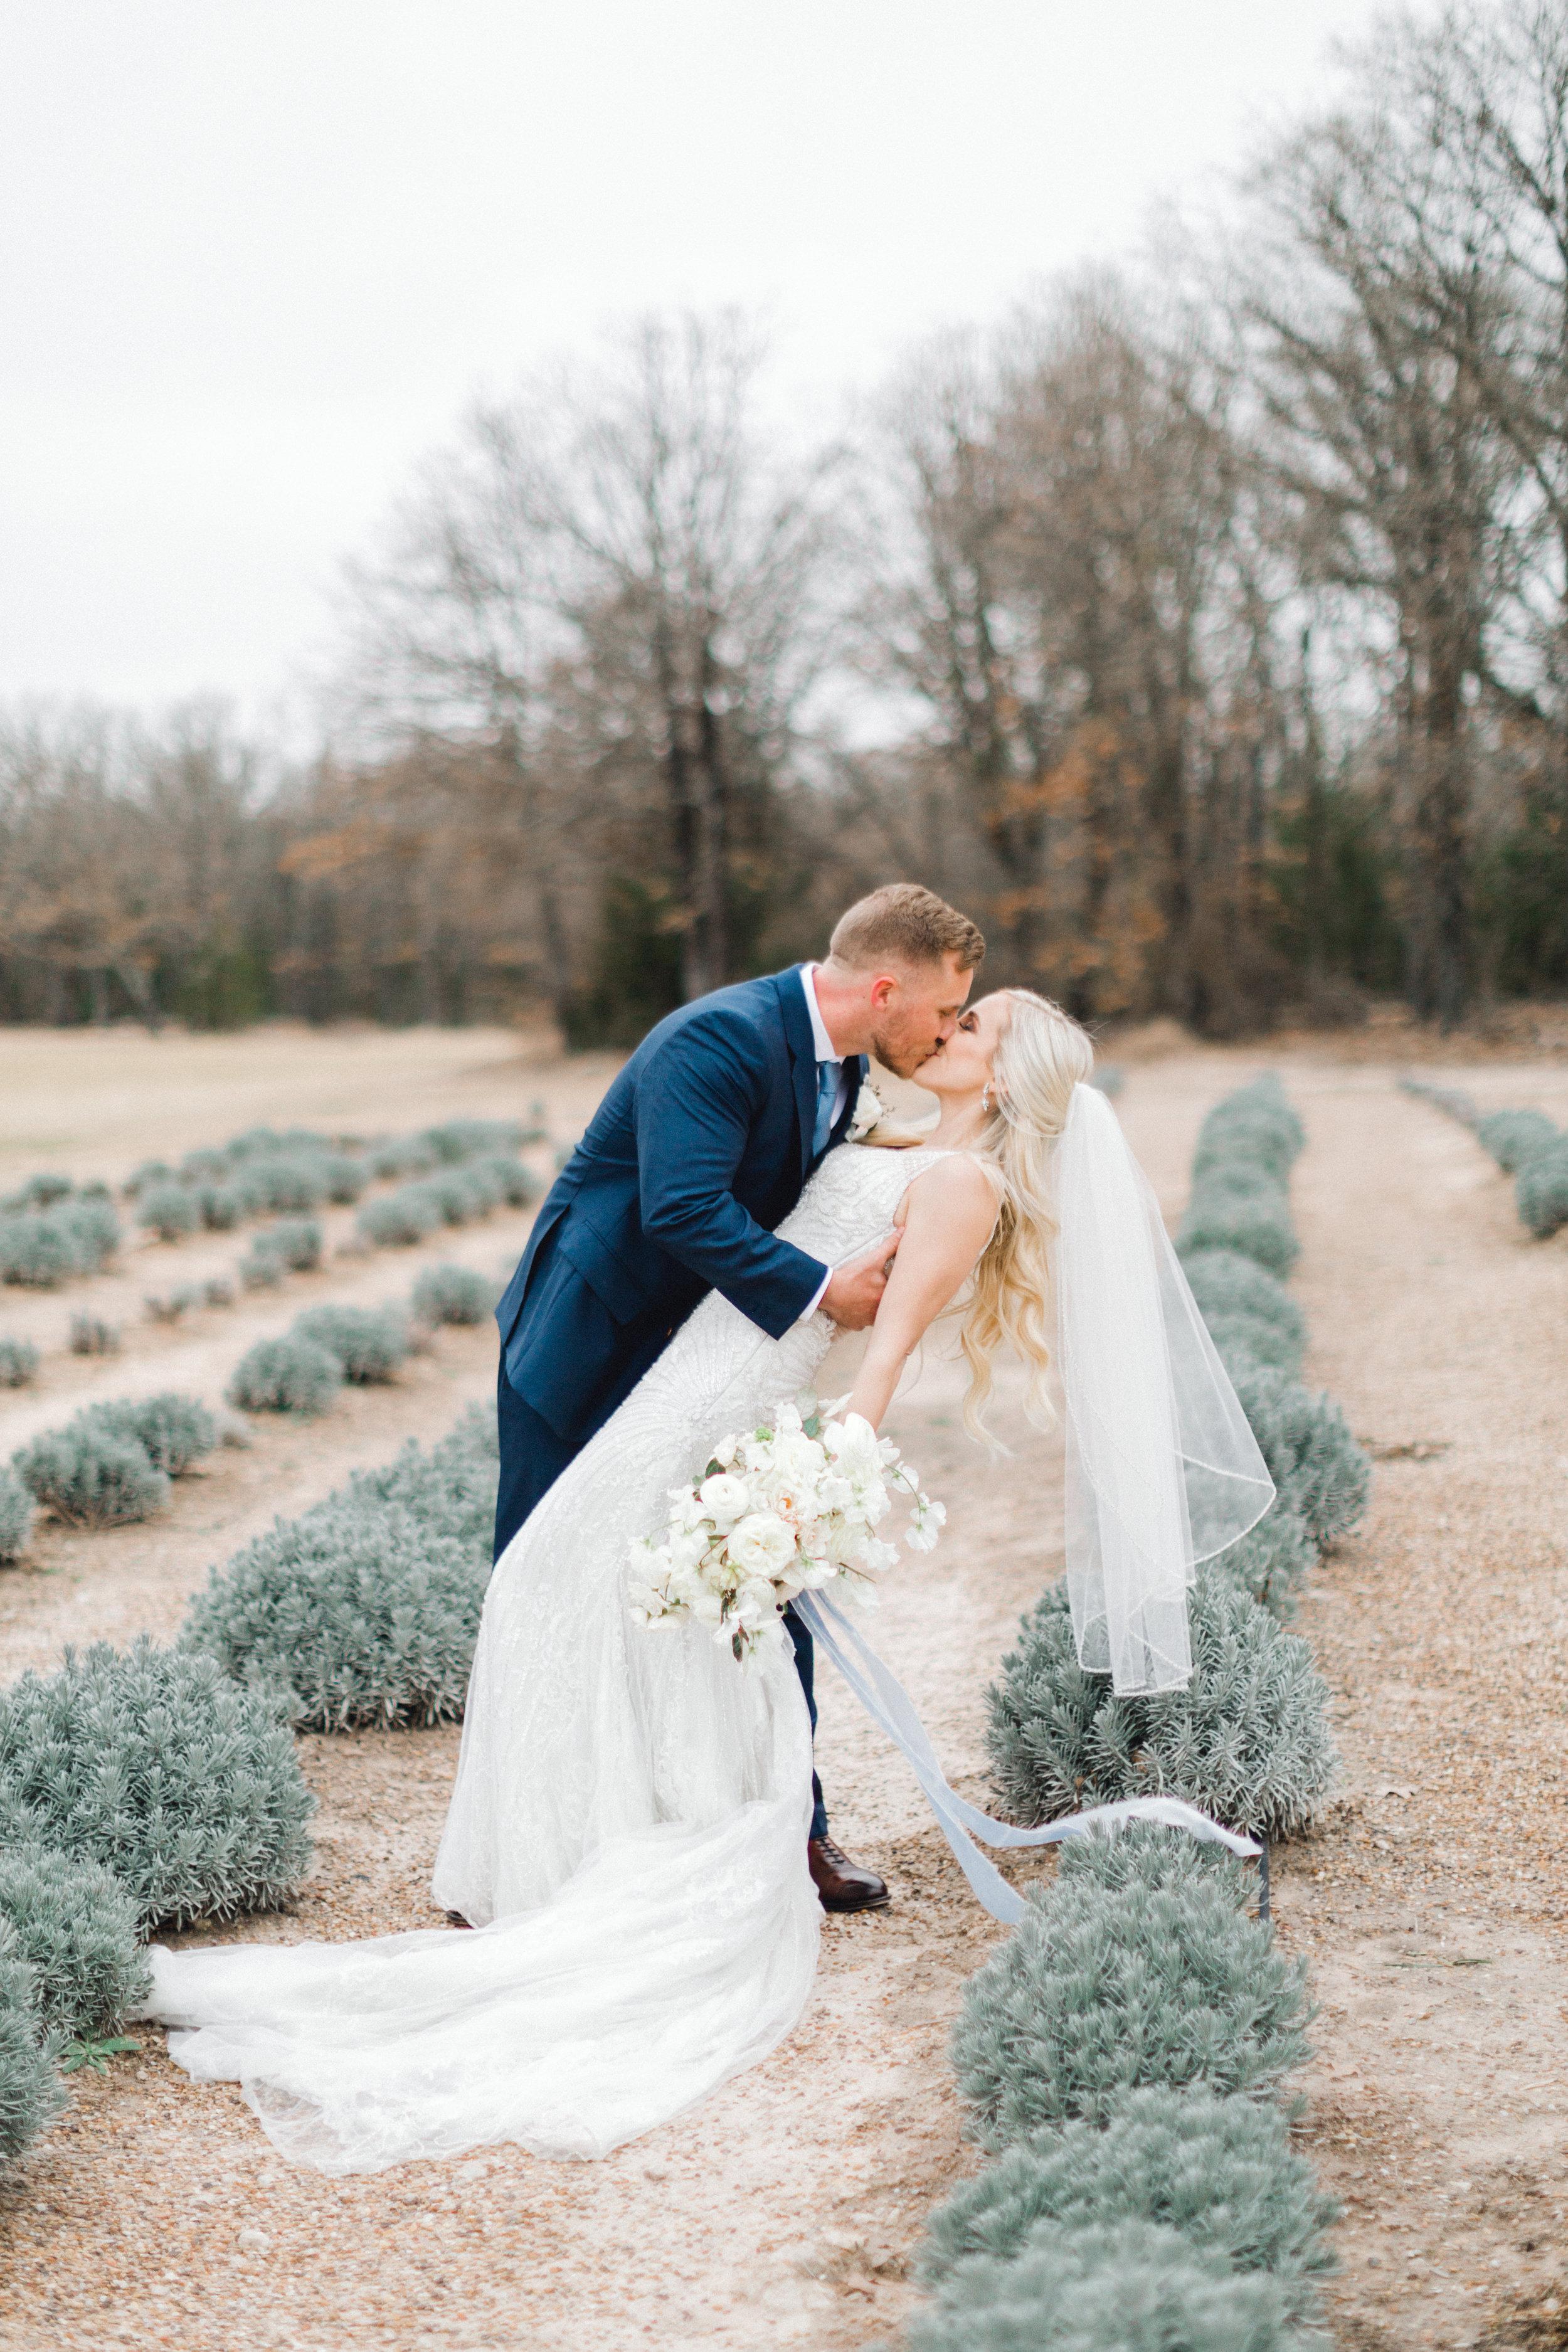 Chloe+Austin Wedding_700.JPG